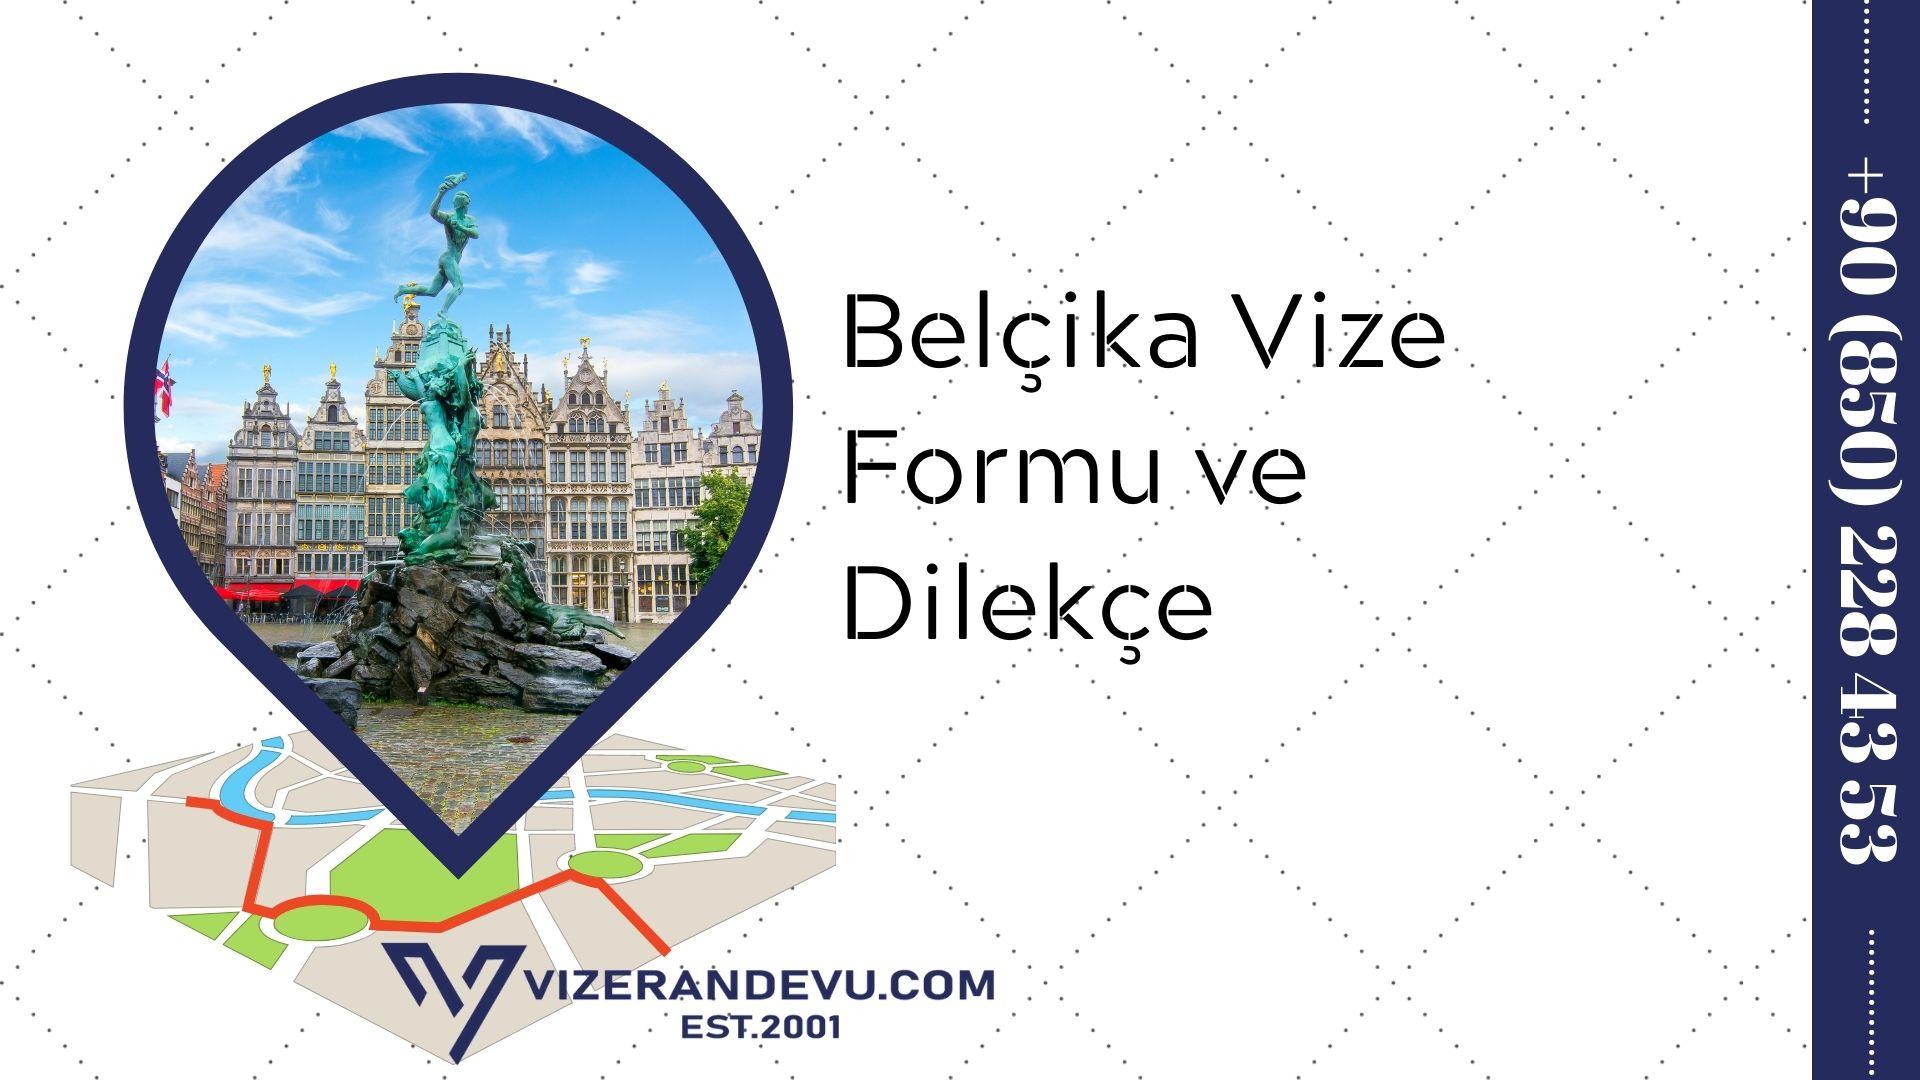 Belçika Vize Formu ve Dilekçe 2021